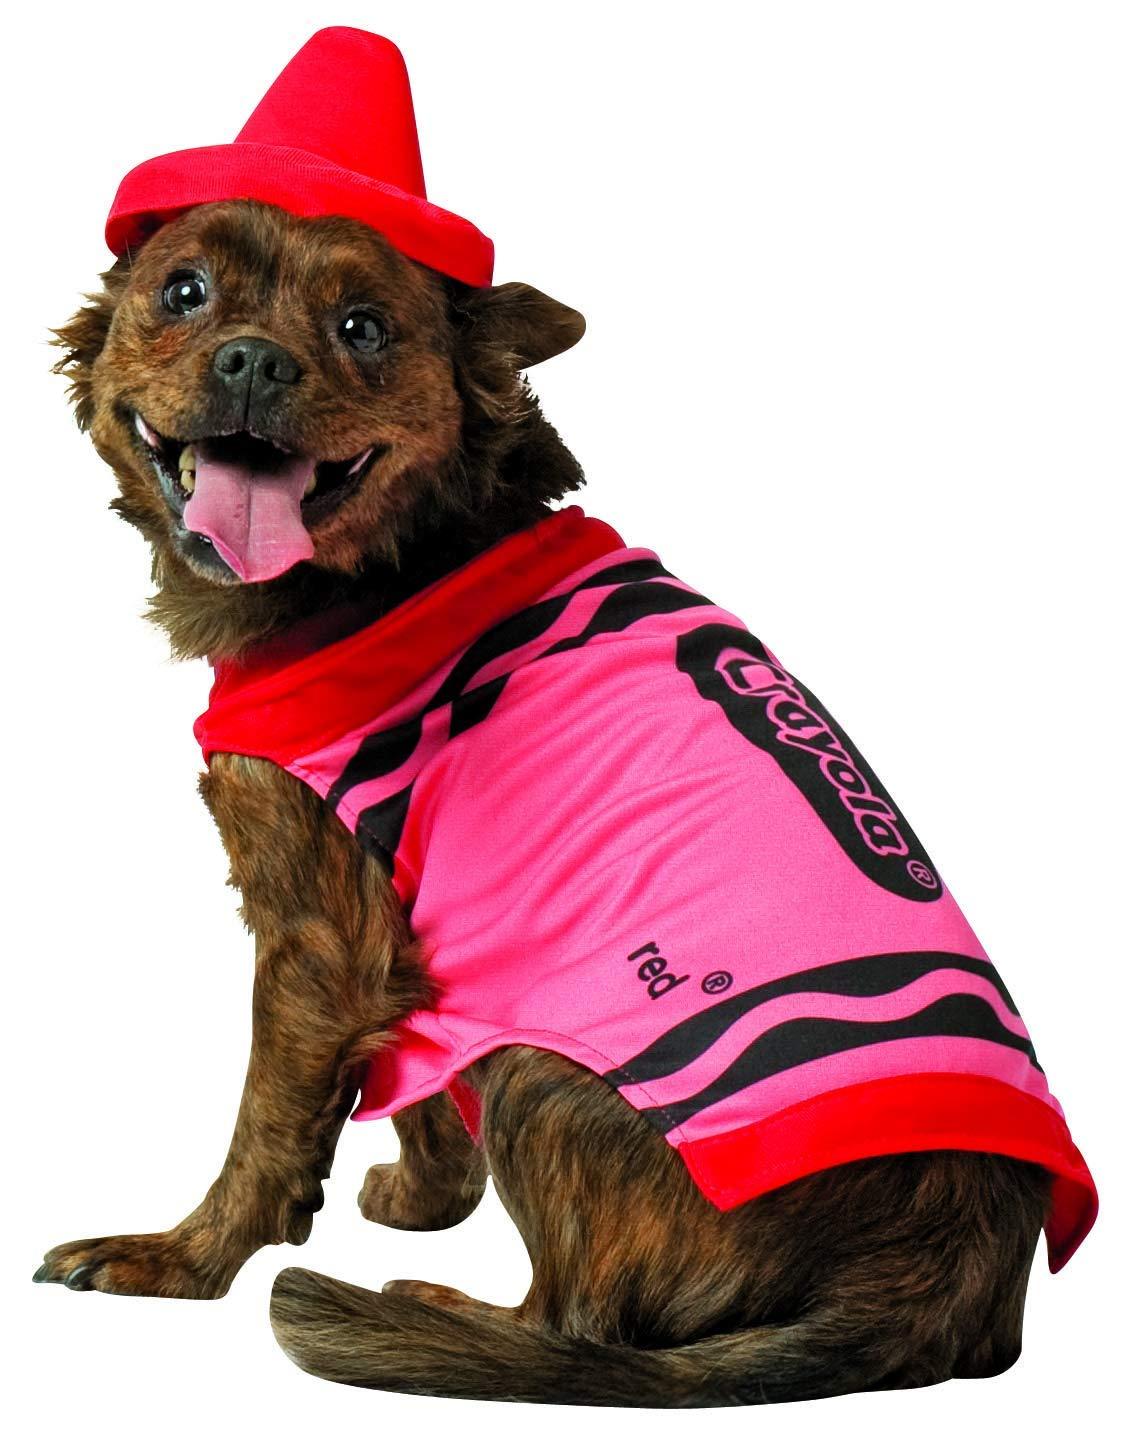 dog costumesbreed | chihuahua, pug, pitbull dog costumes & more